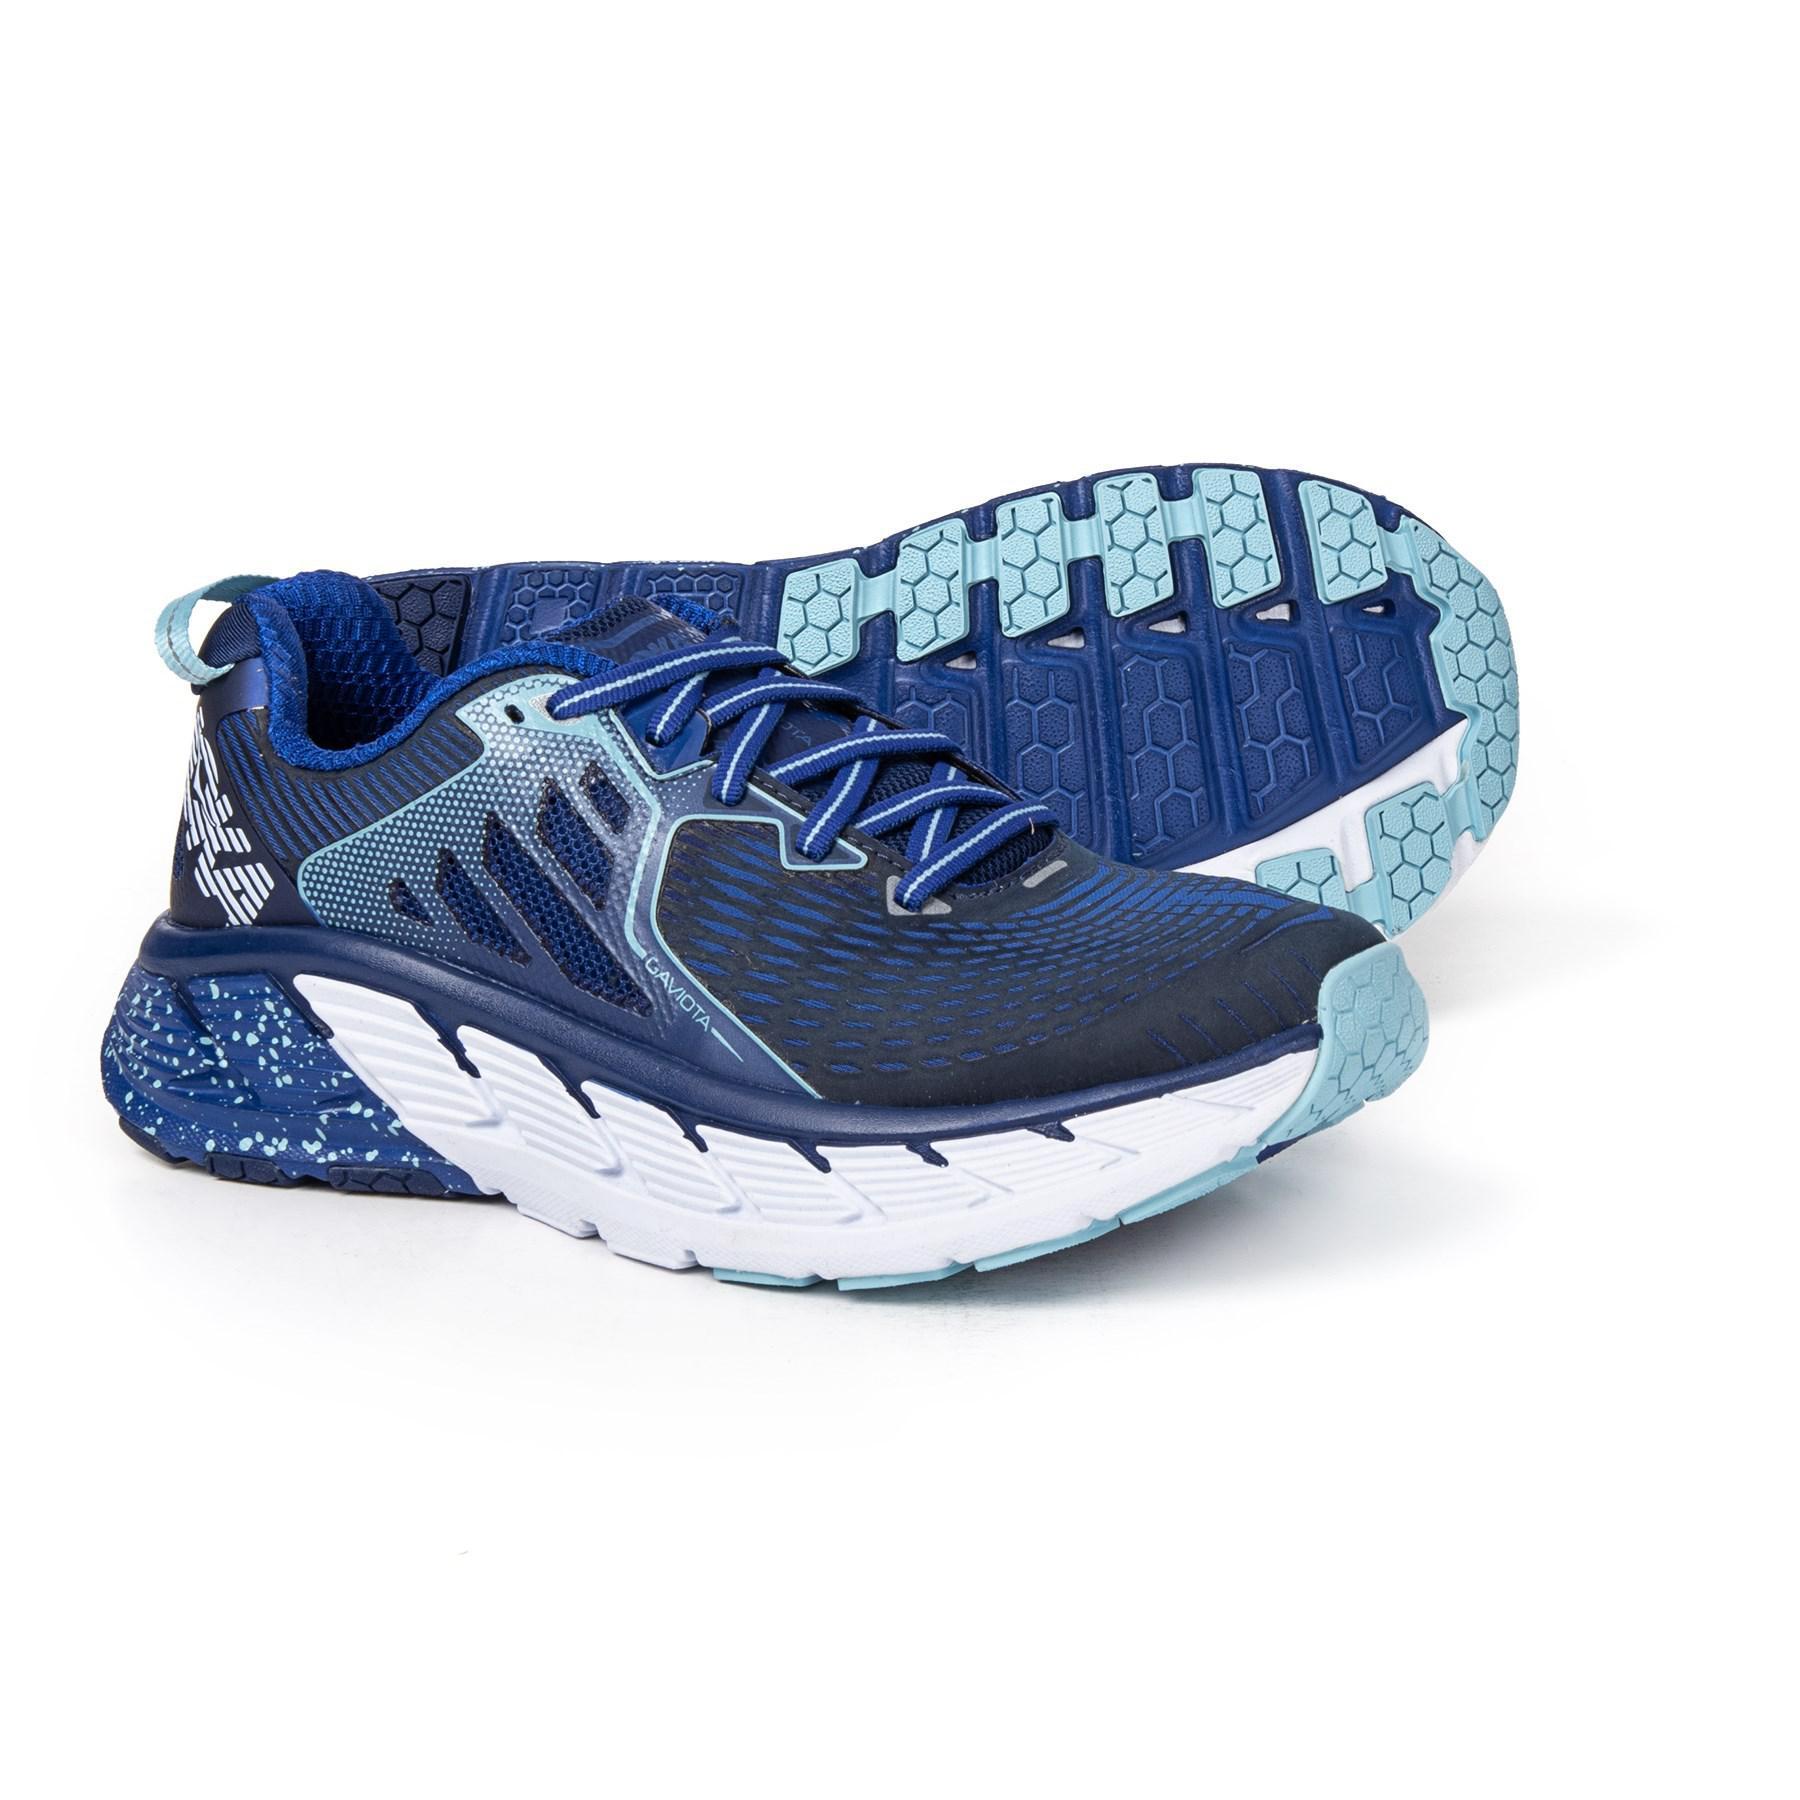 Gaviota Trail Running Shoes